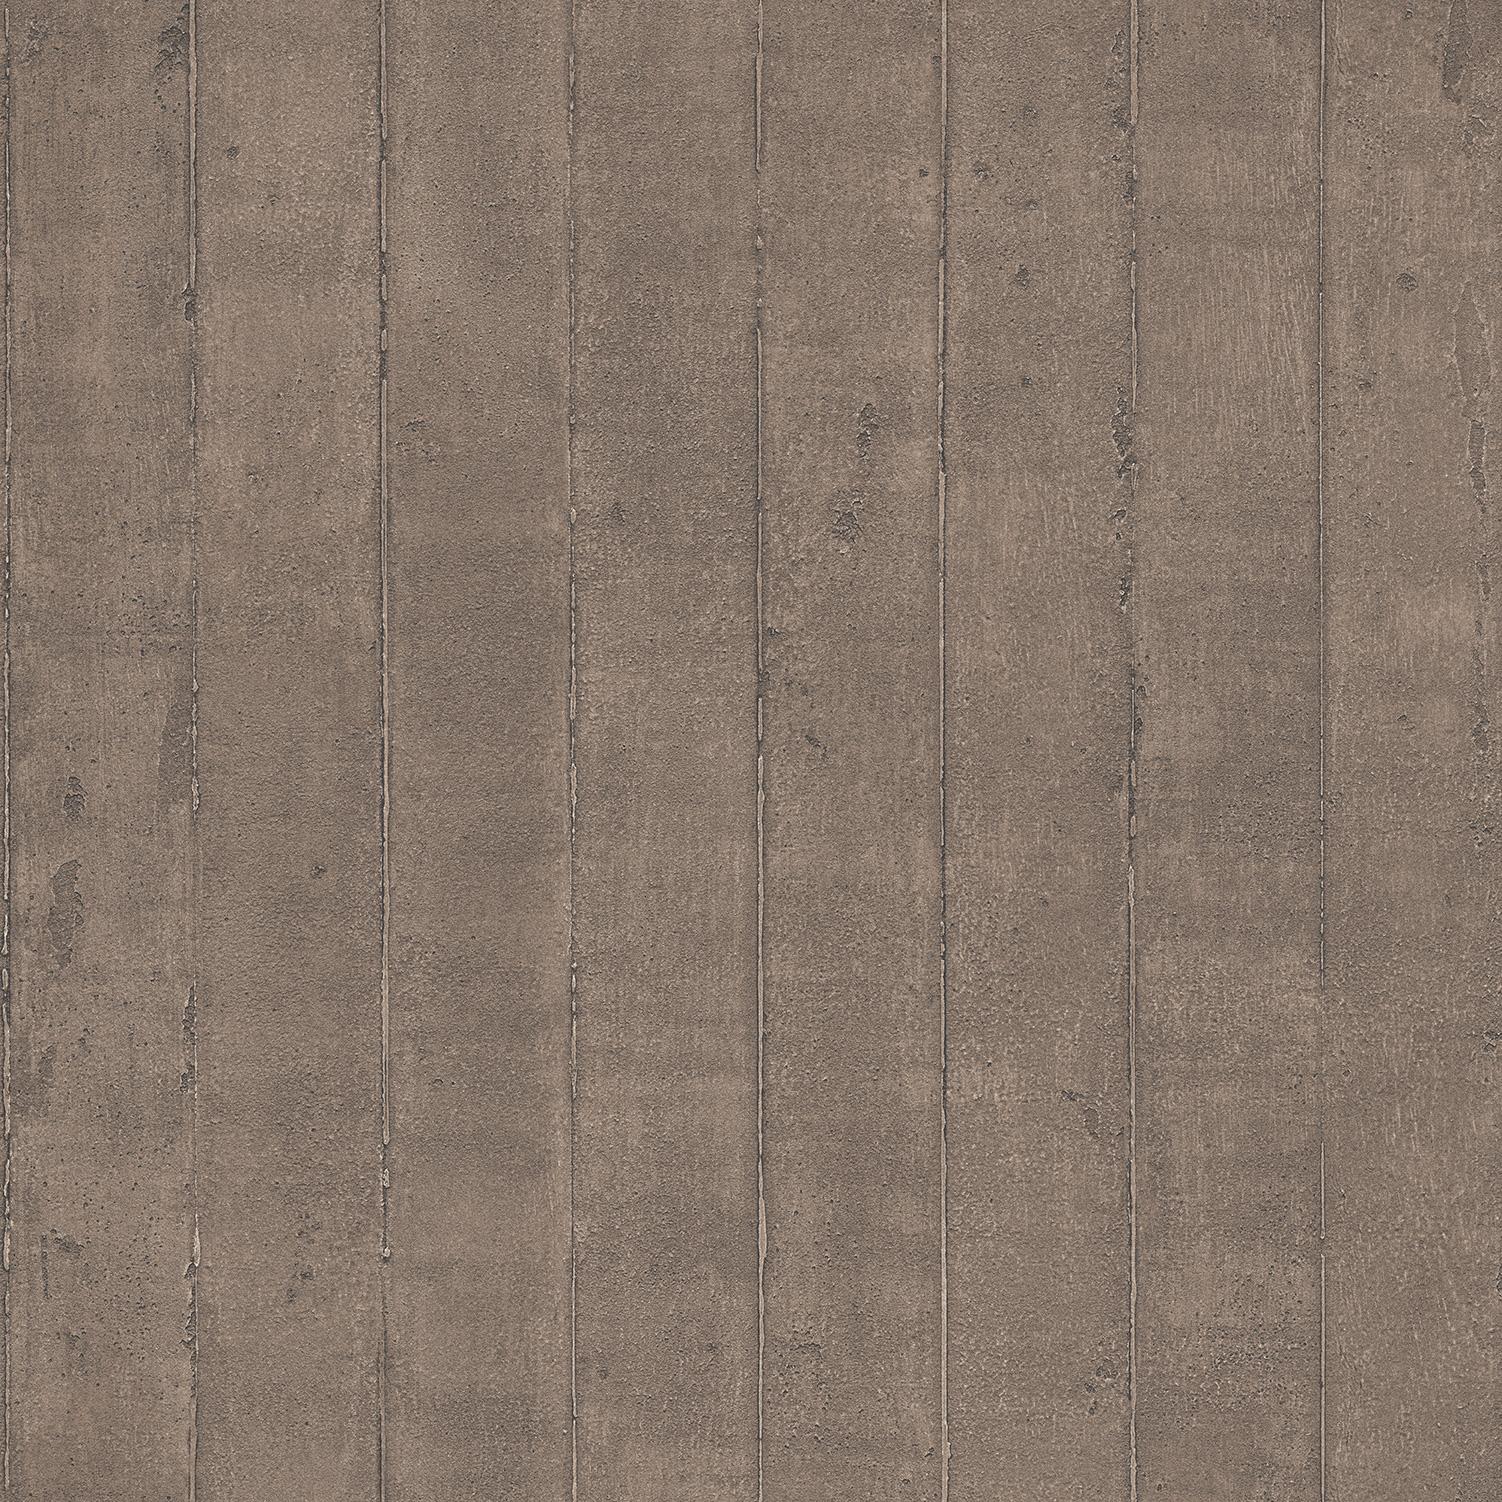 Steampunk Tapete - Beton G56240 (Braun)